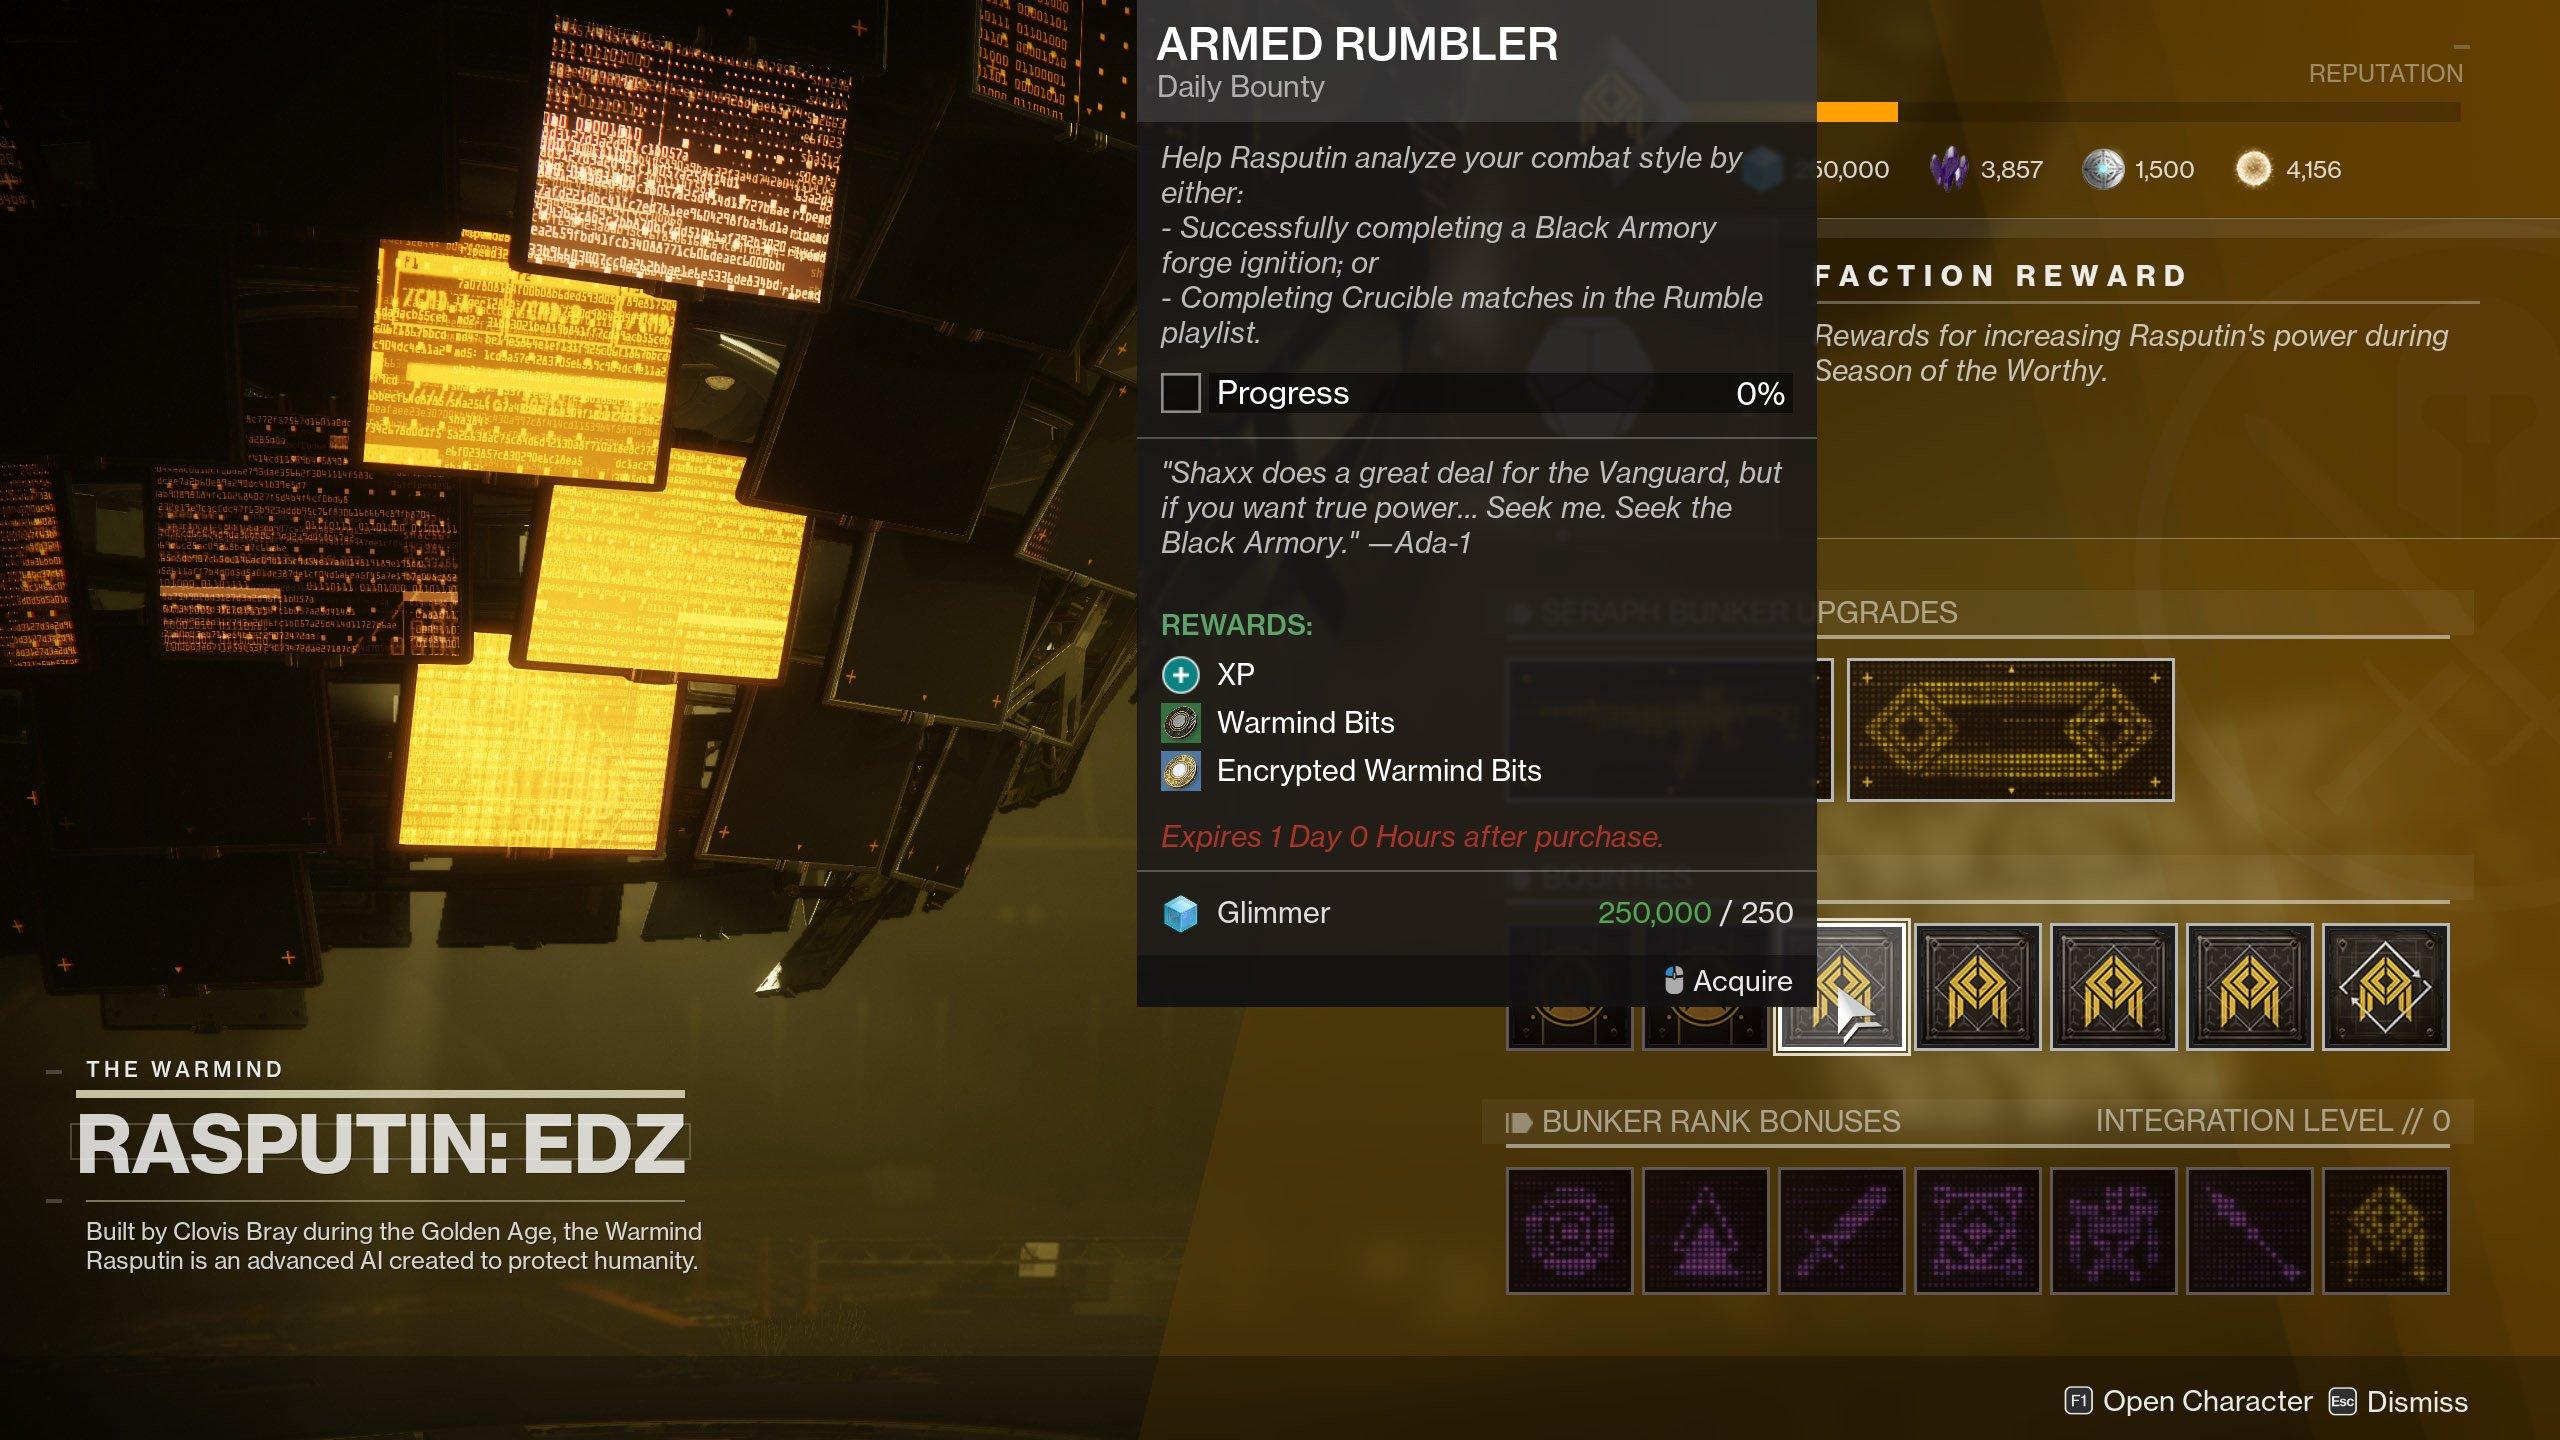 Warmind Bits Destiny 2